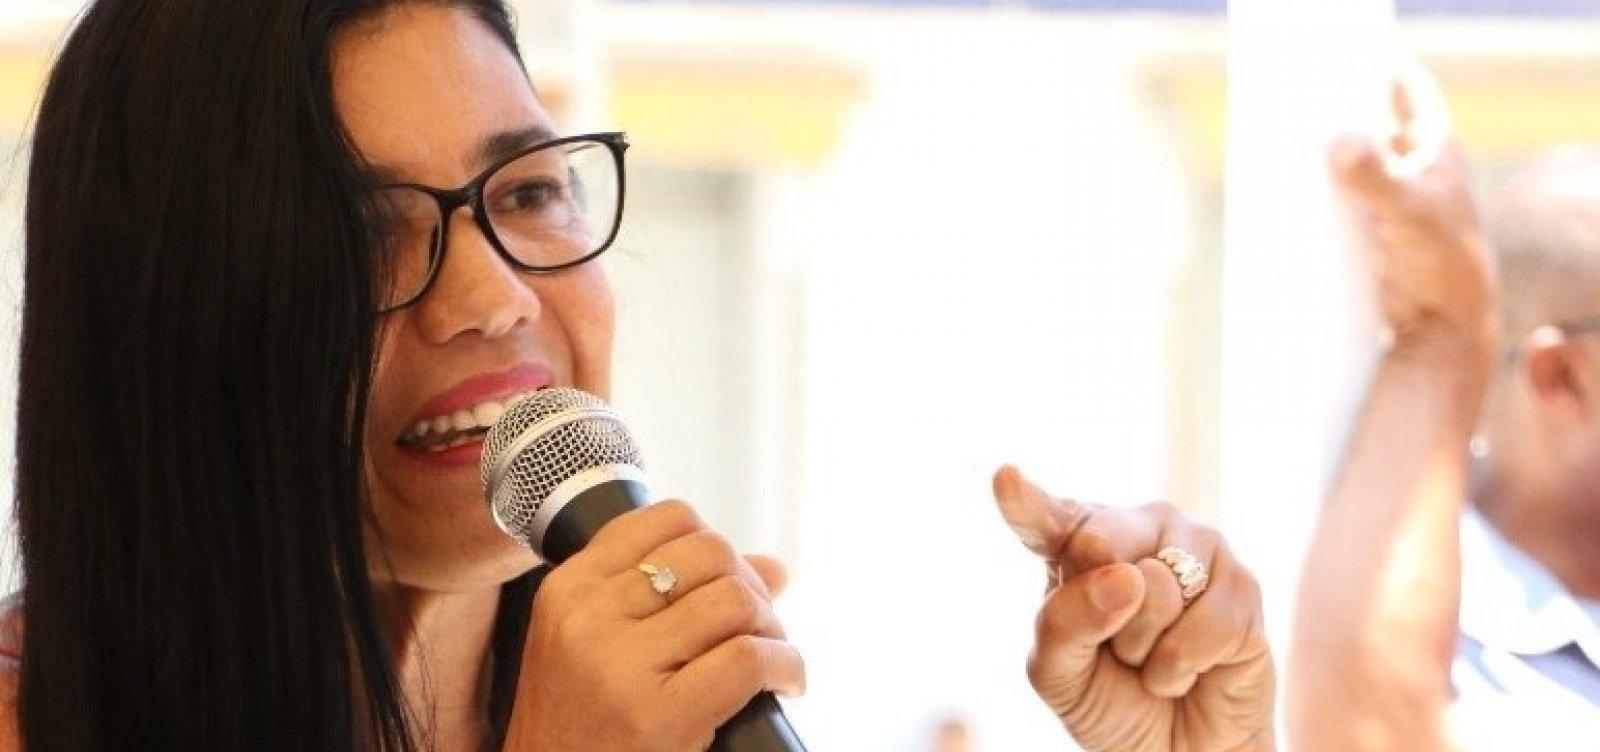 Amargosa: PSD racha após presidente anunciar apoio a mulher de deputado do PP